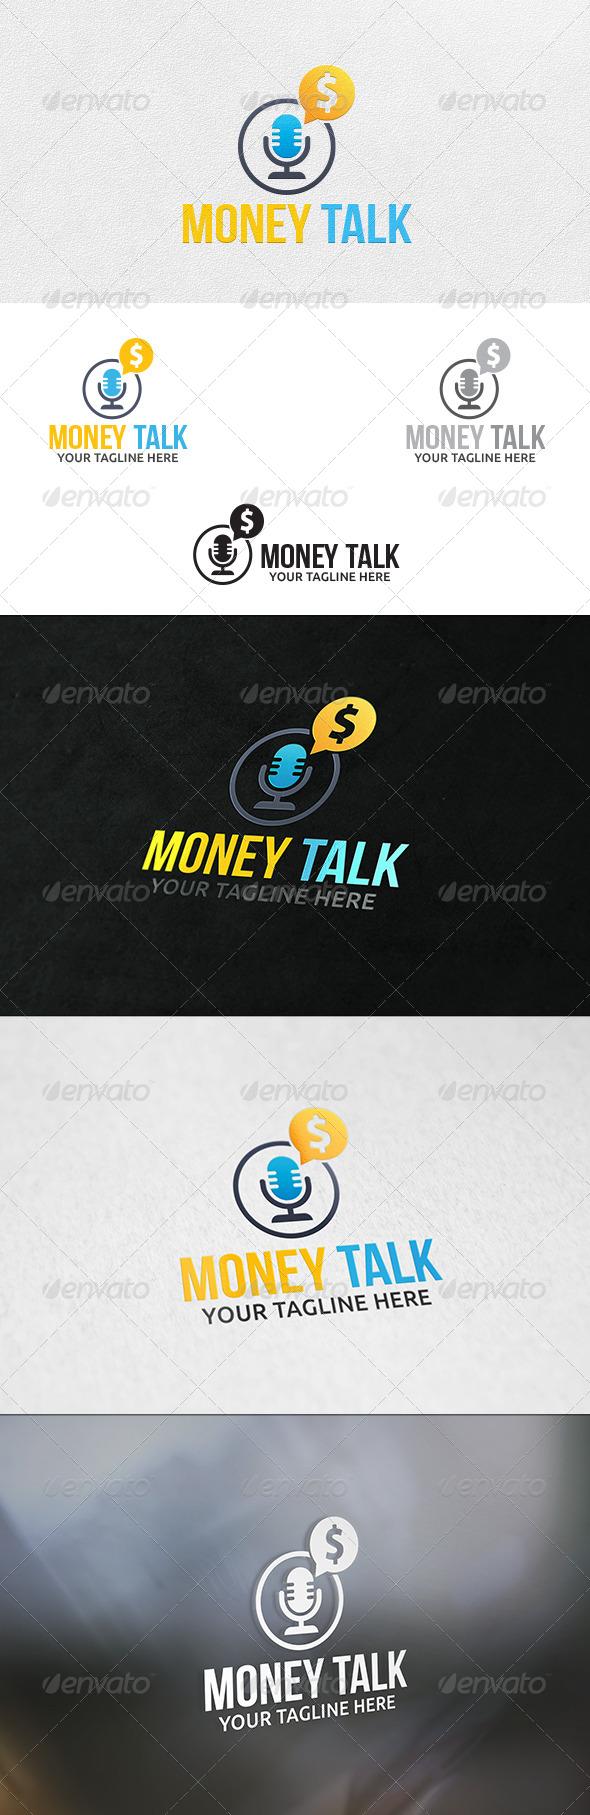 GraphicRiver Money Talk Logo Template 6439799